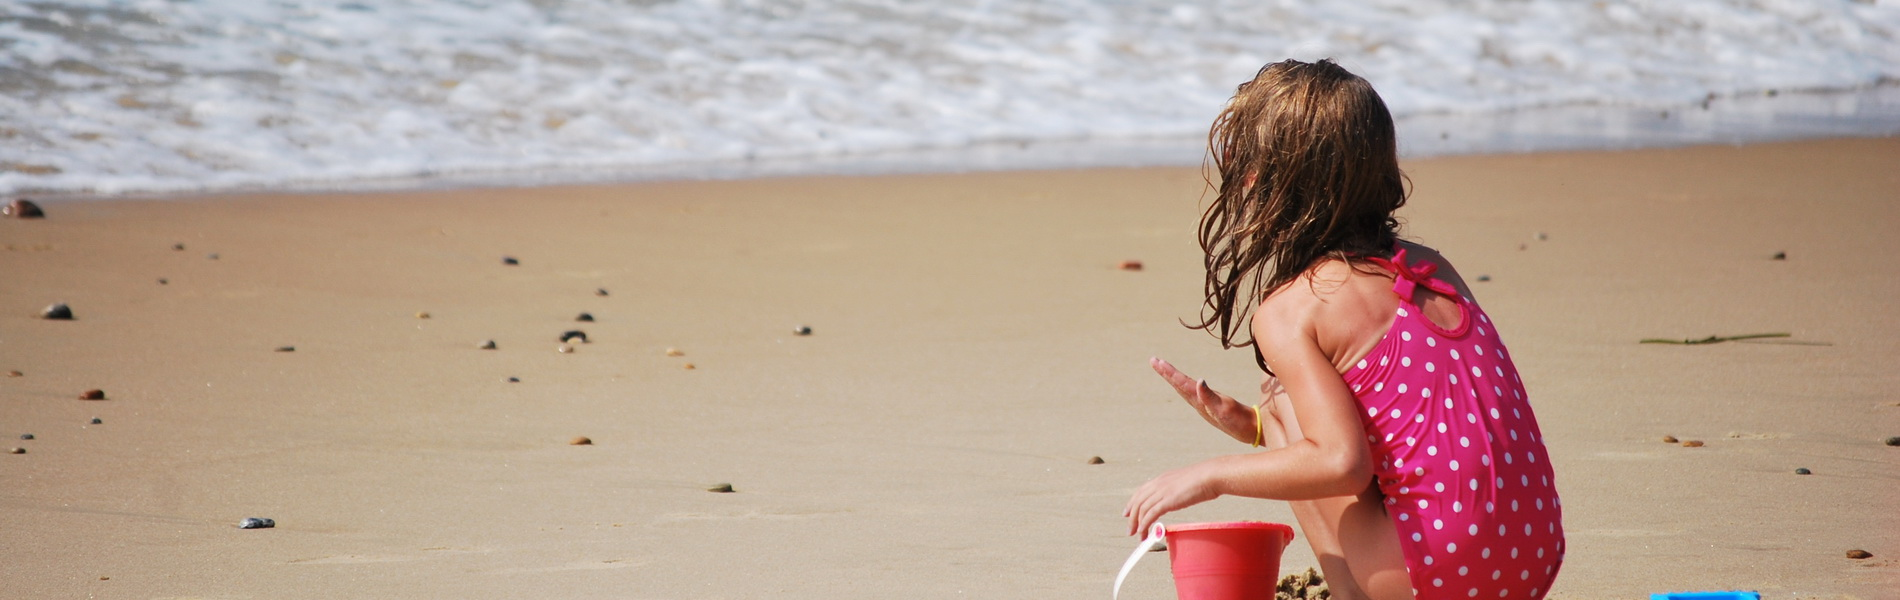 Kind spielt am Strand, CC0 Creative Commons